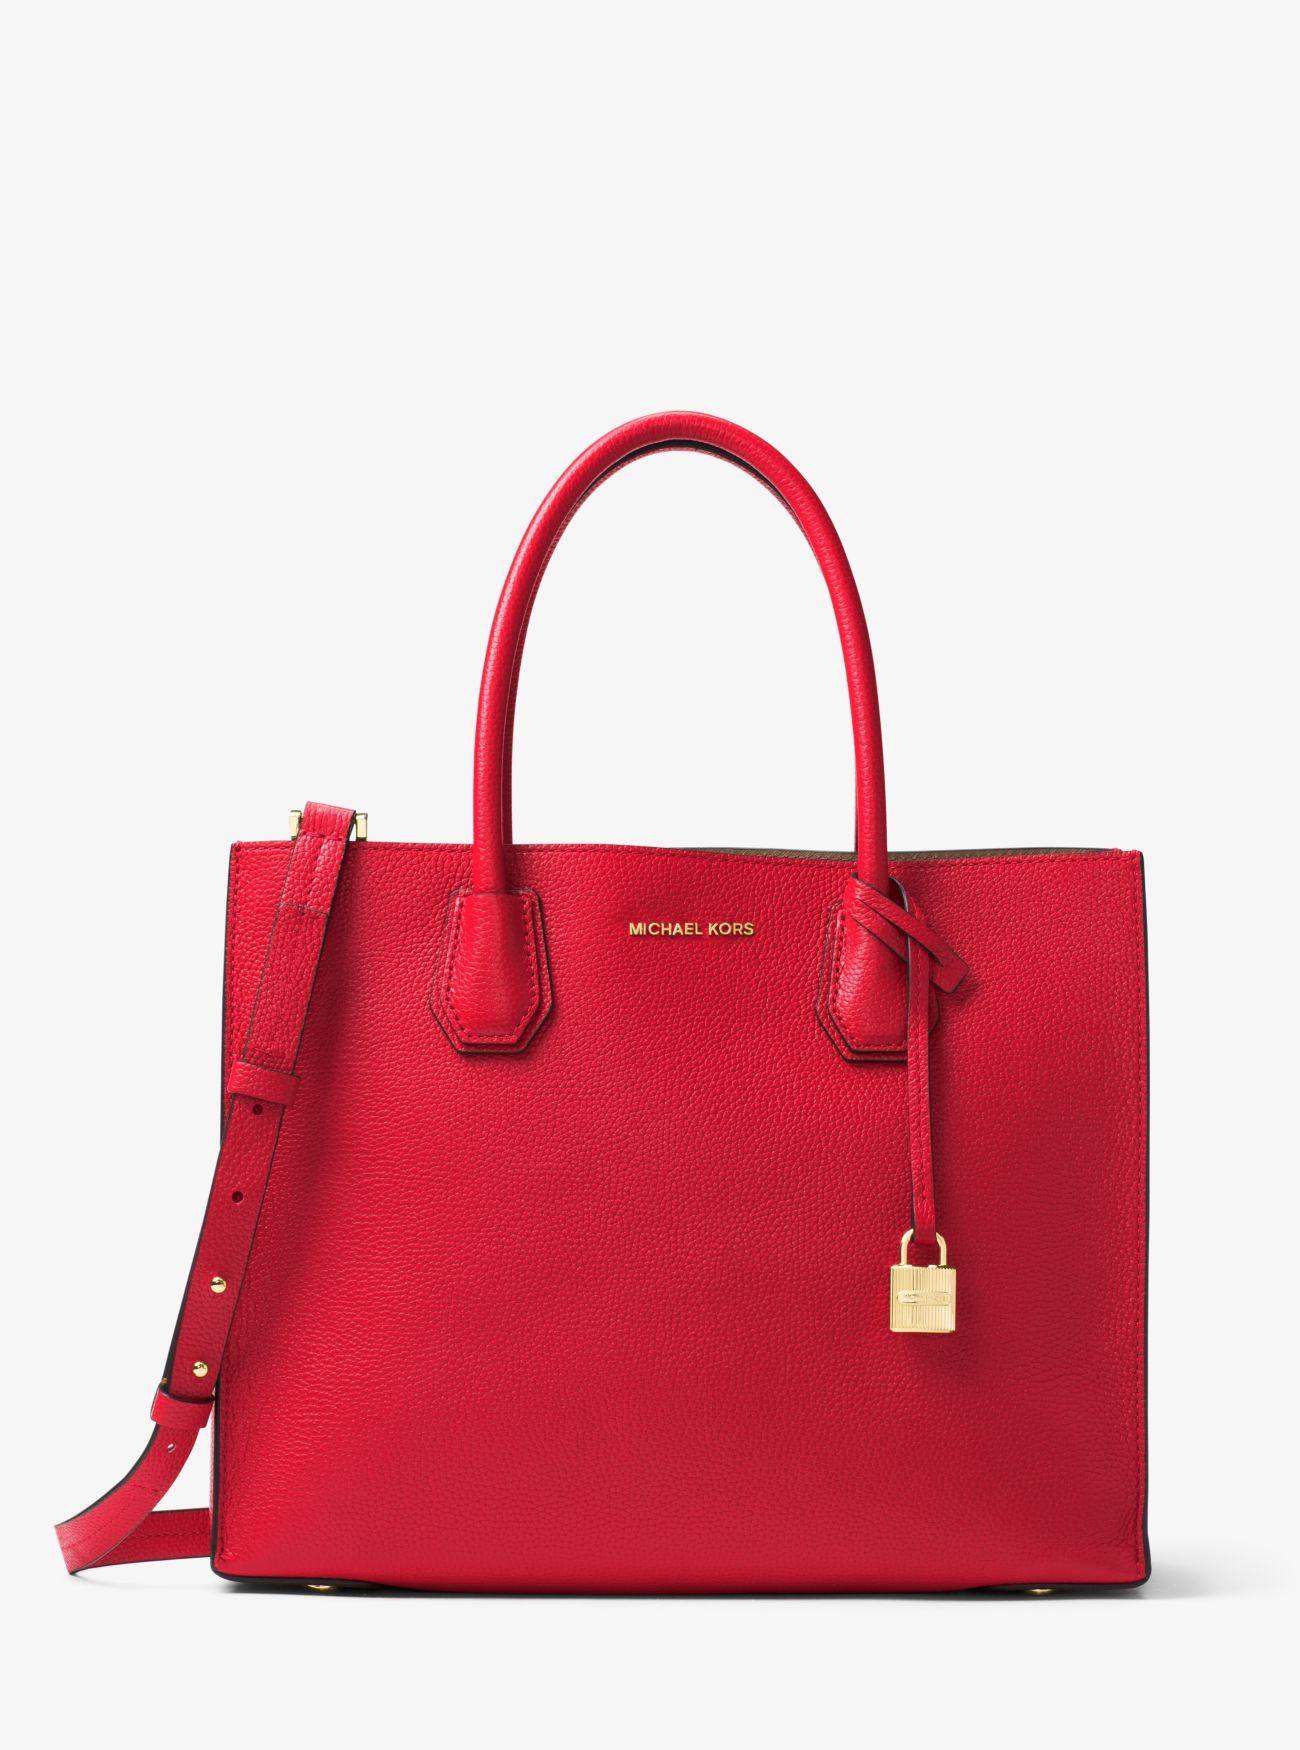 Grand sac à main Mercer à soufflets en cuir grainé | Michael Kors